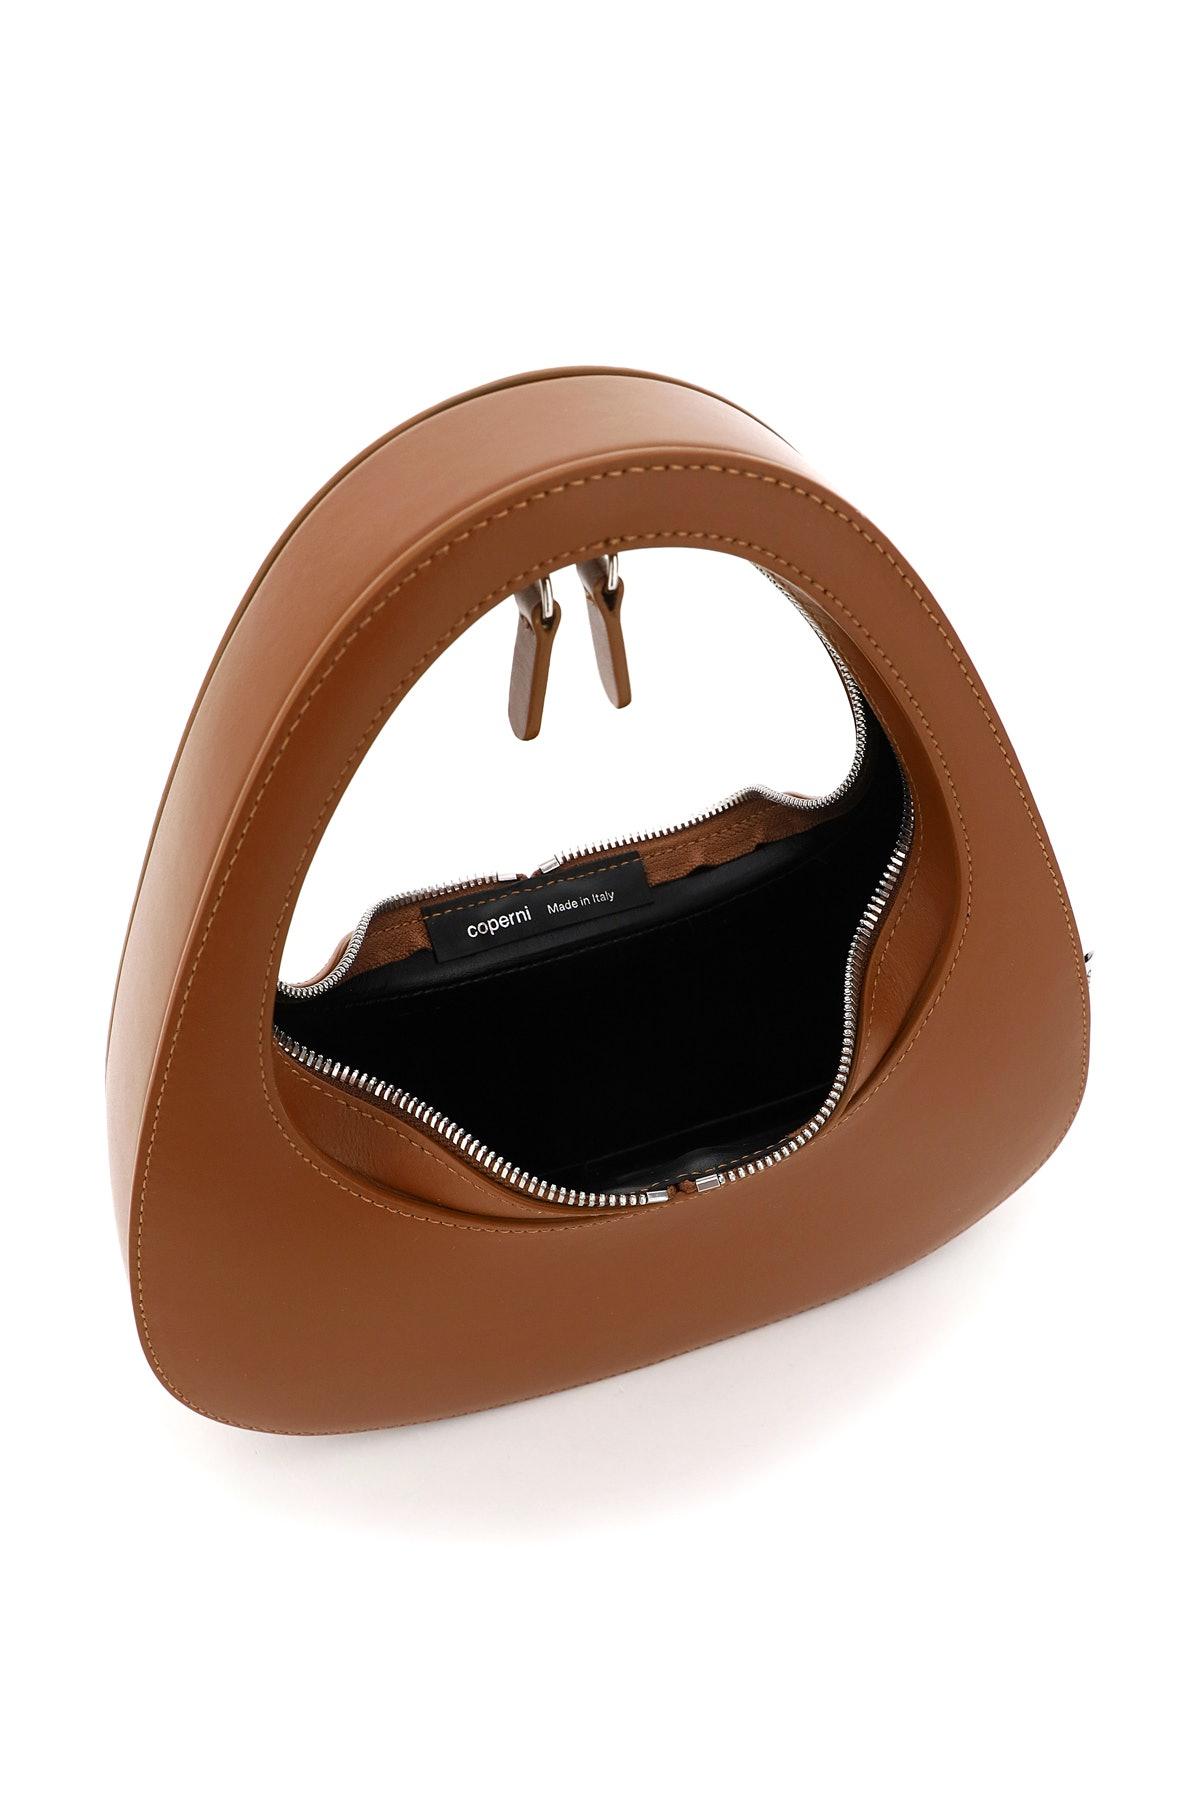 Coperni Baguette Swipe Bag: additional image